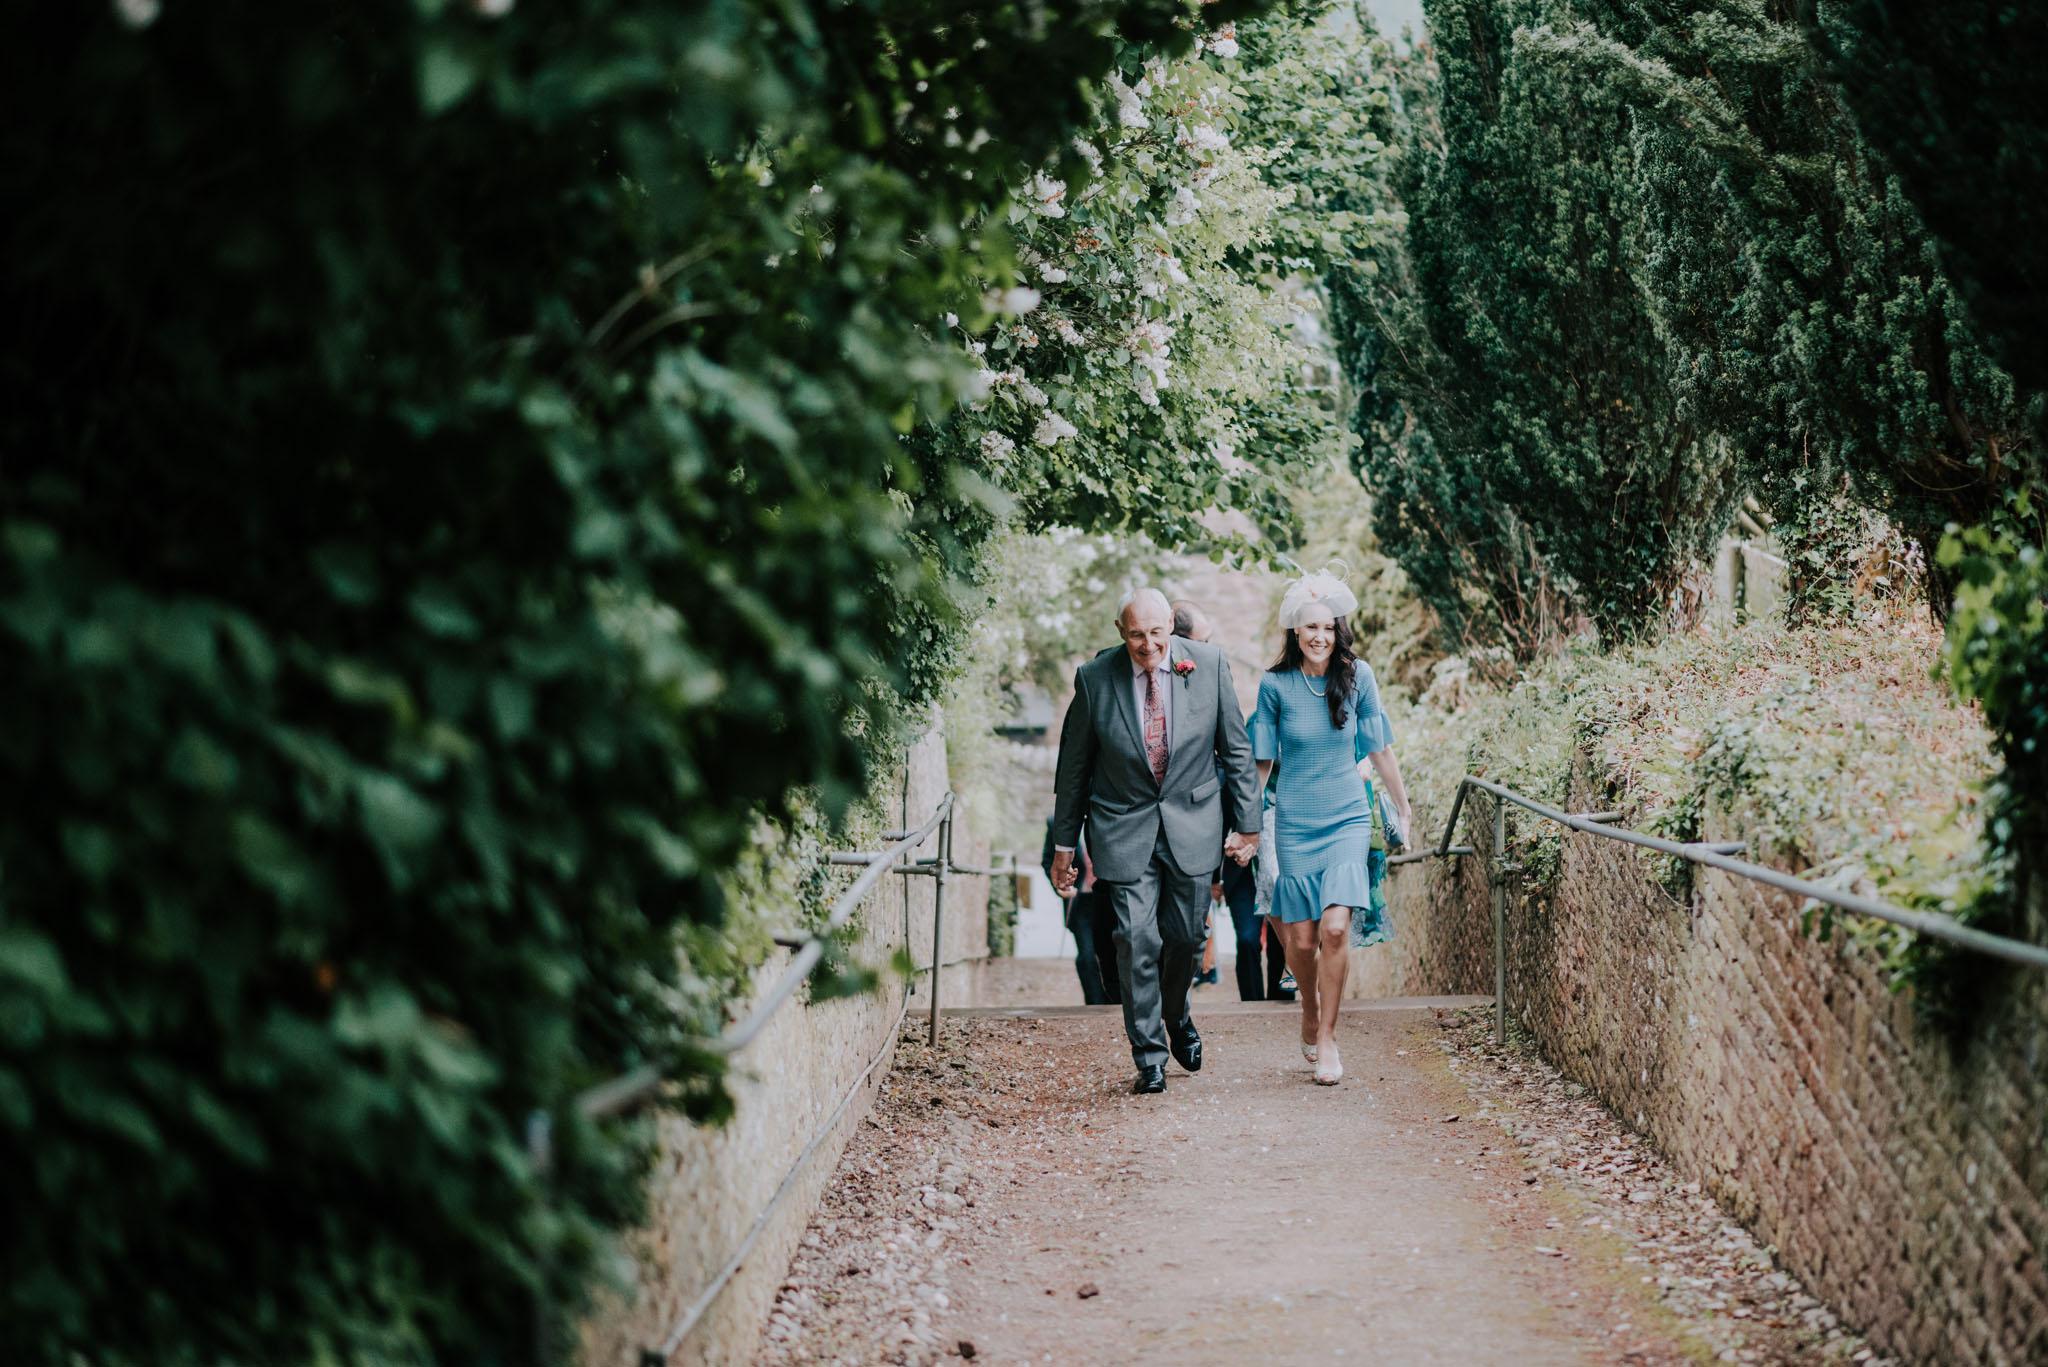 wedding-photographer-glewstone-court-hereford-scott-stockwell-photography099.jpg